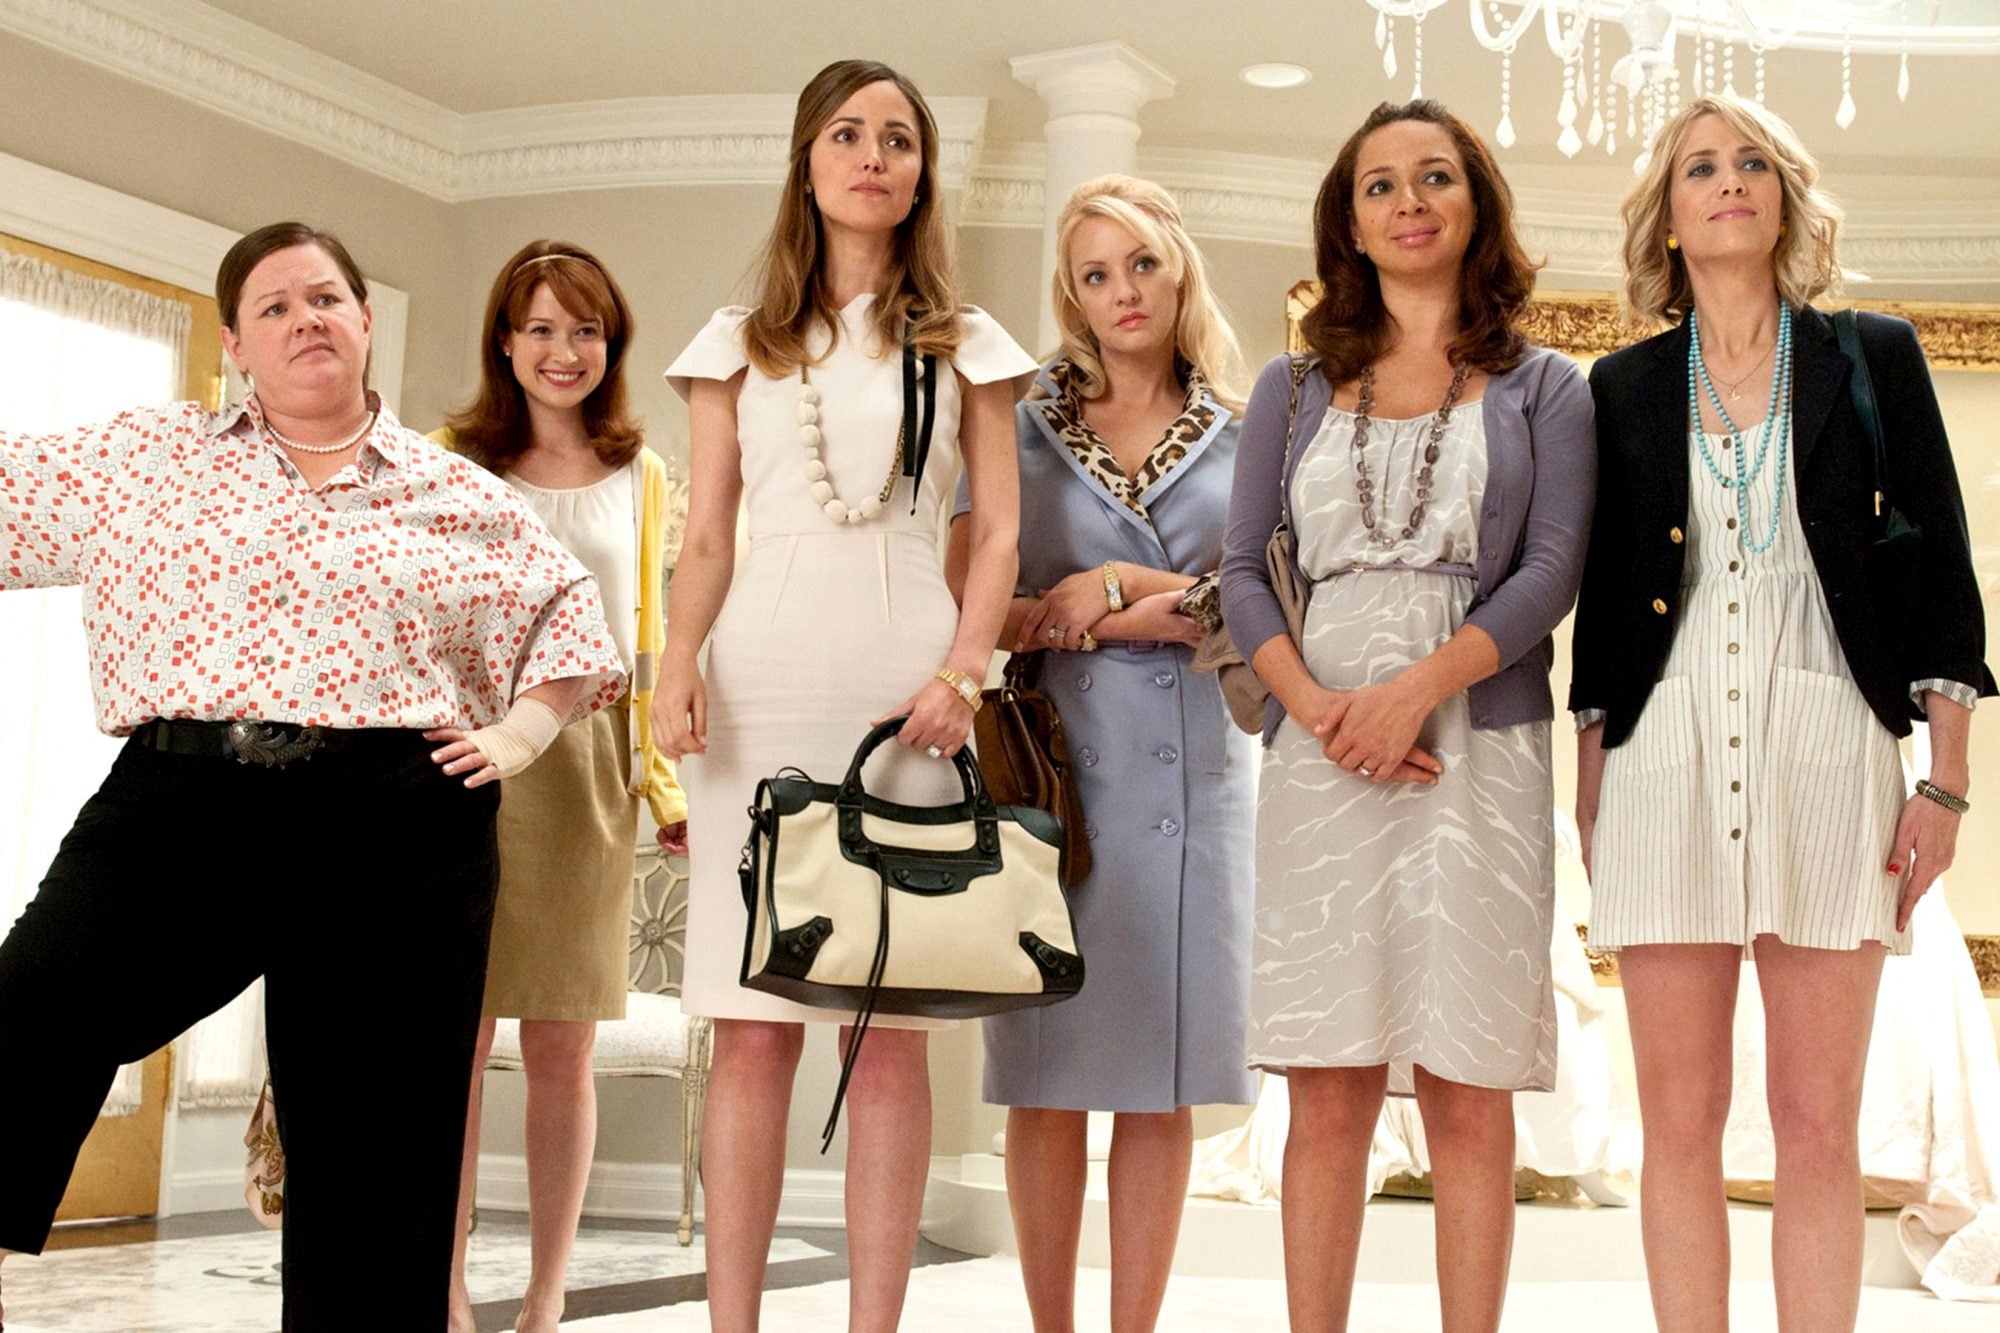 BRIDESMAIDS, from left: Melissa McCarthy, Ellie Kemper, Rose Byrne, Wendi McLendon-Covey, Maya Rudol